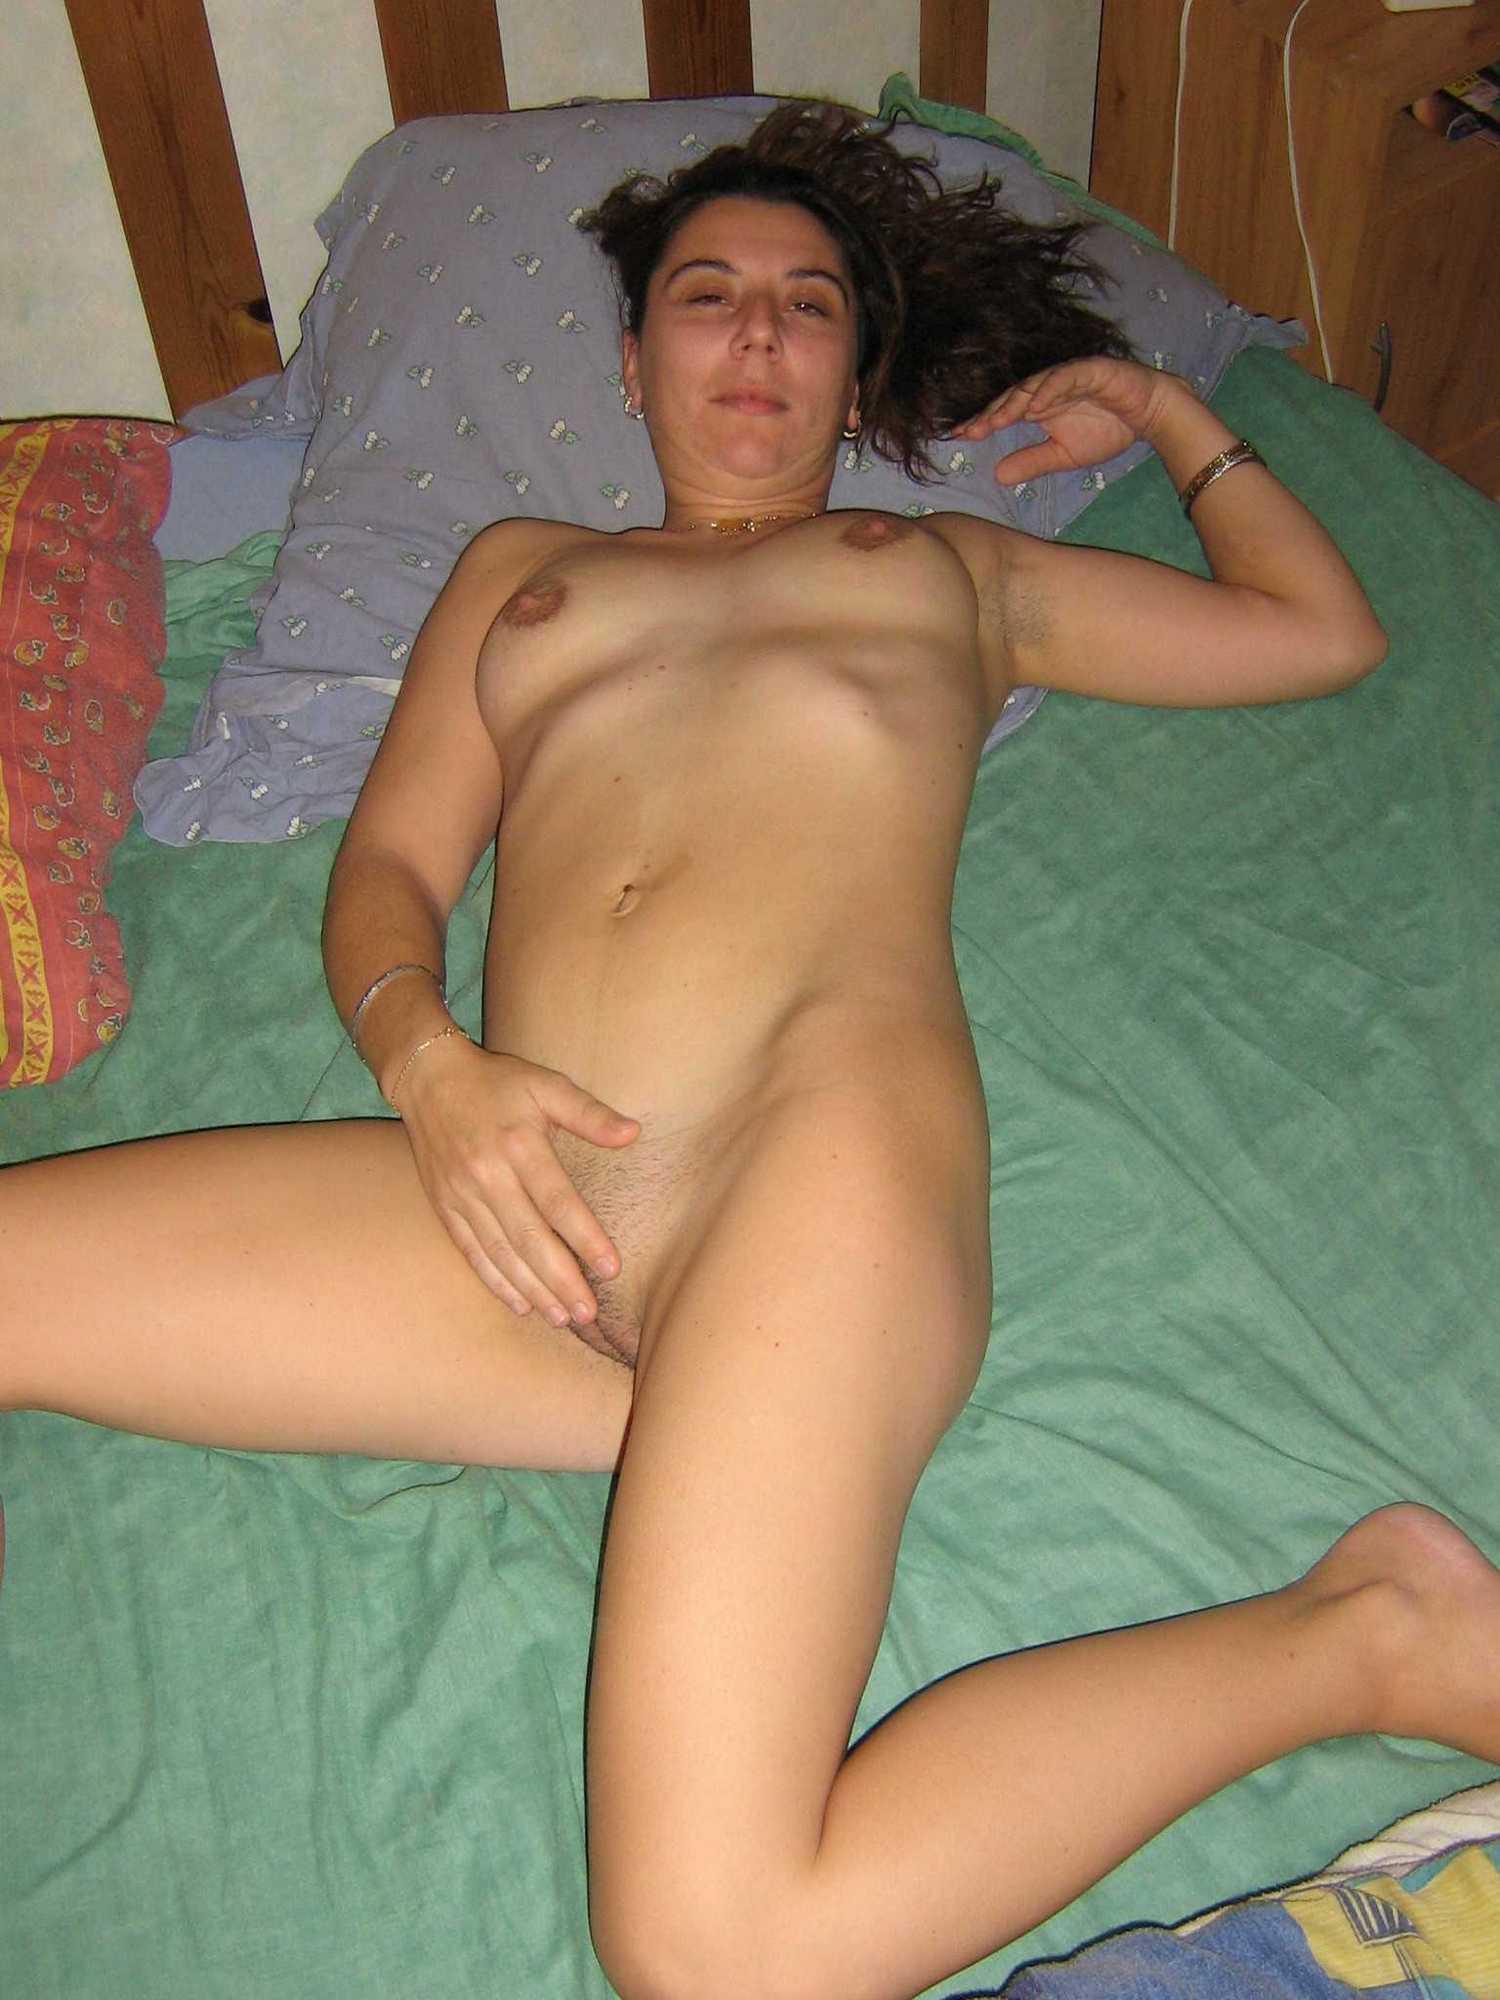 Тридцатишестилетняя зазноба мастурбирует мохнатку лежа на кровати